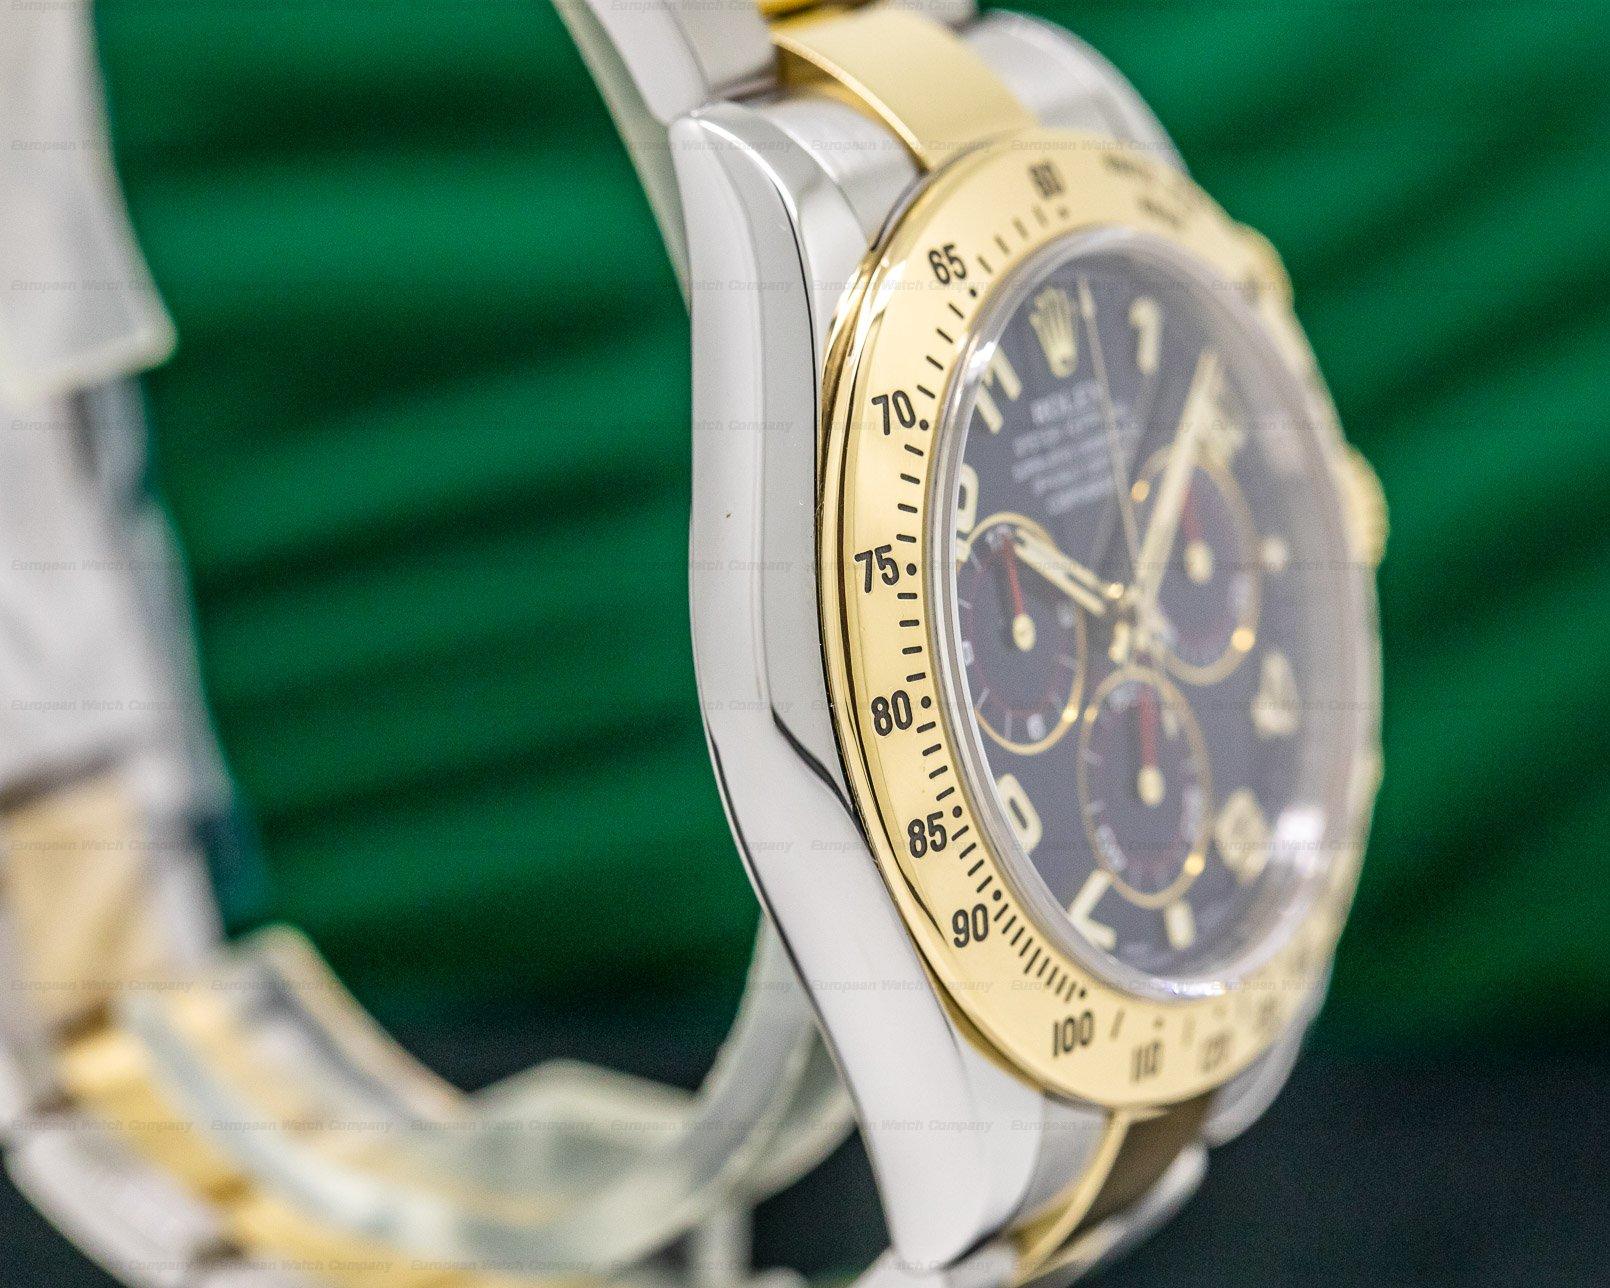 Rolex 116503 Daytona Blue Dial 18K Yellow Gold / SS